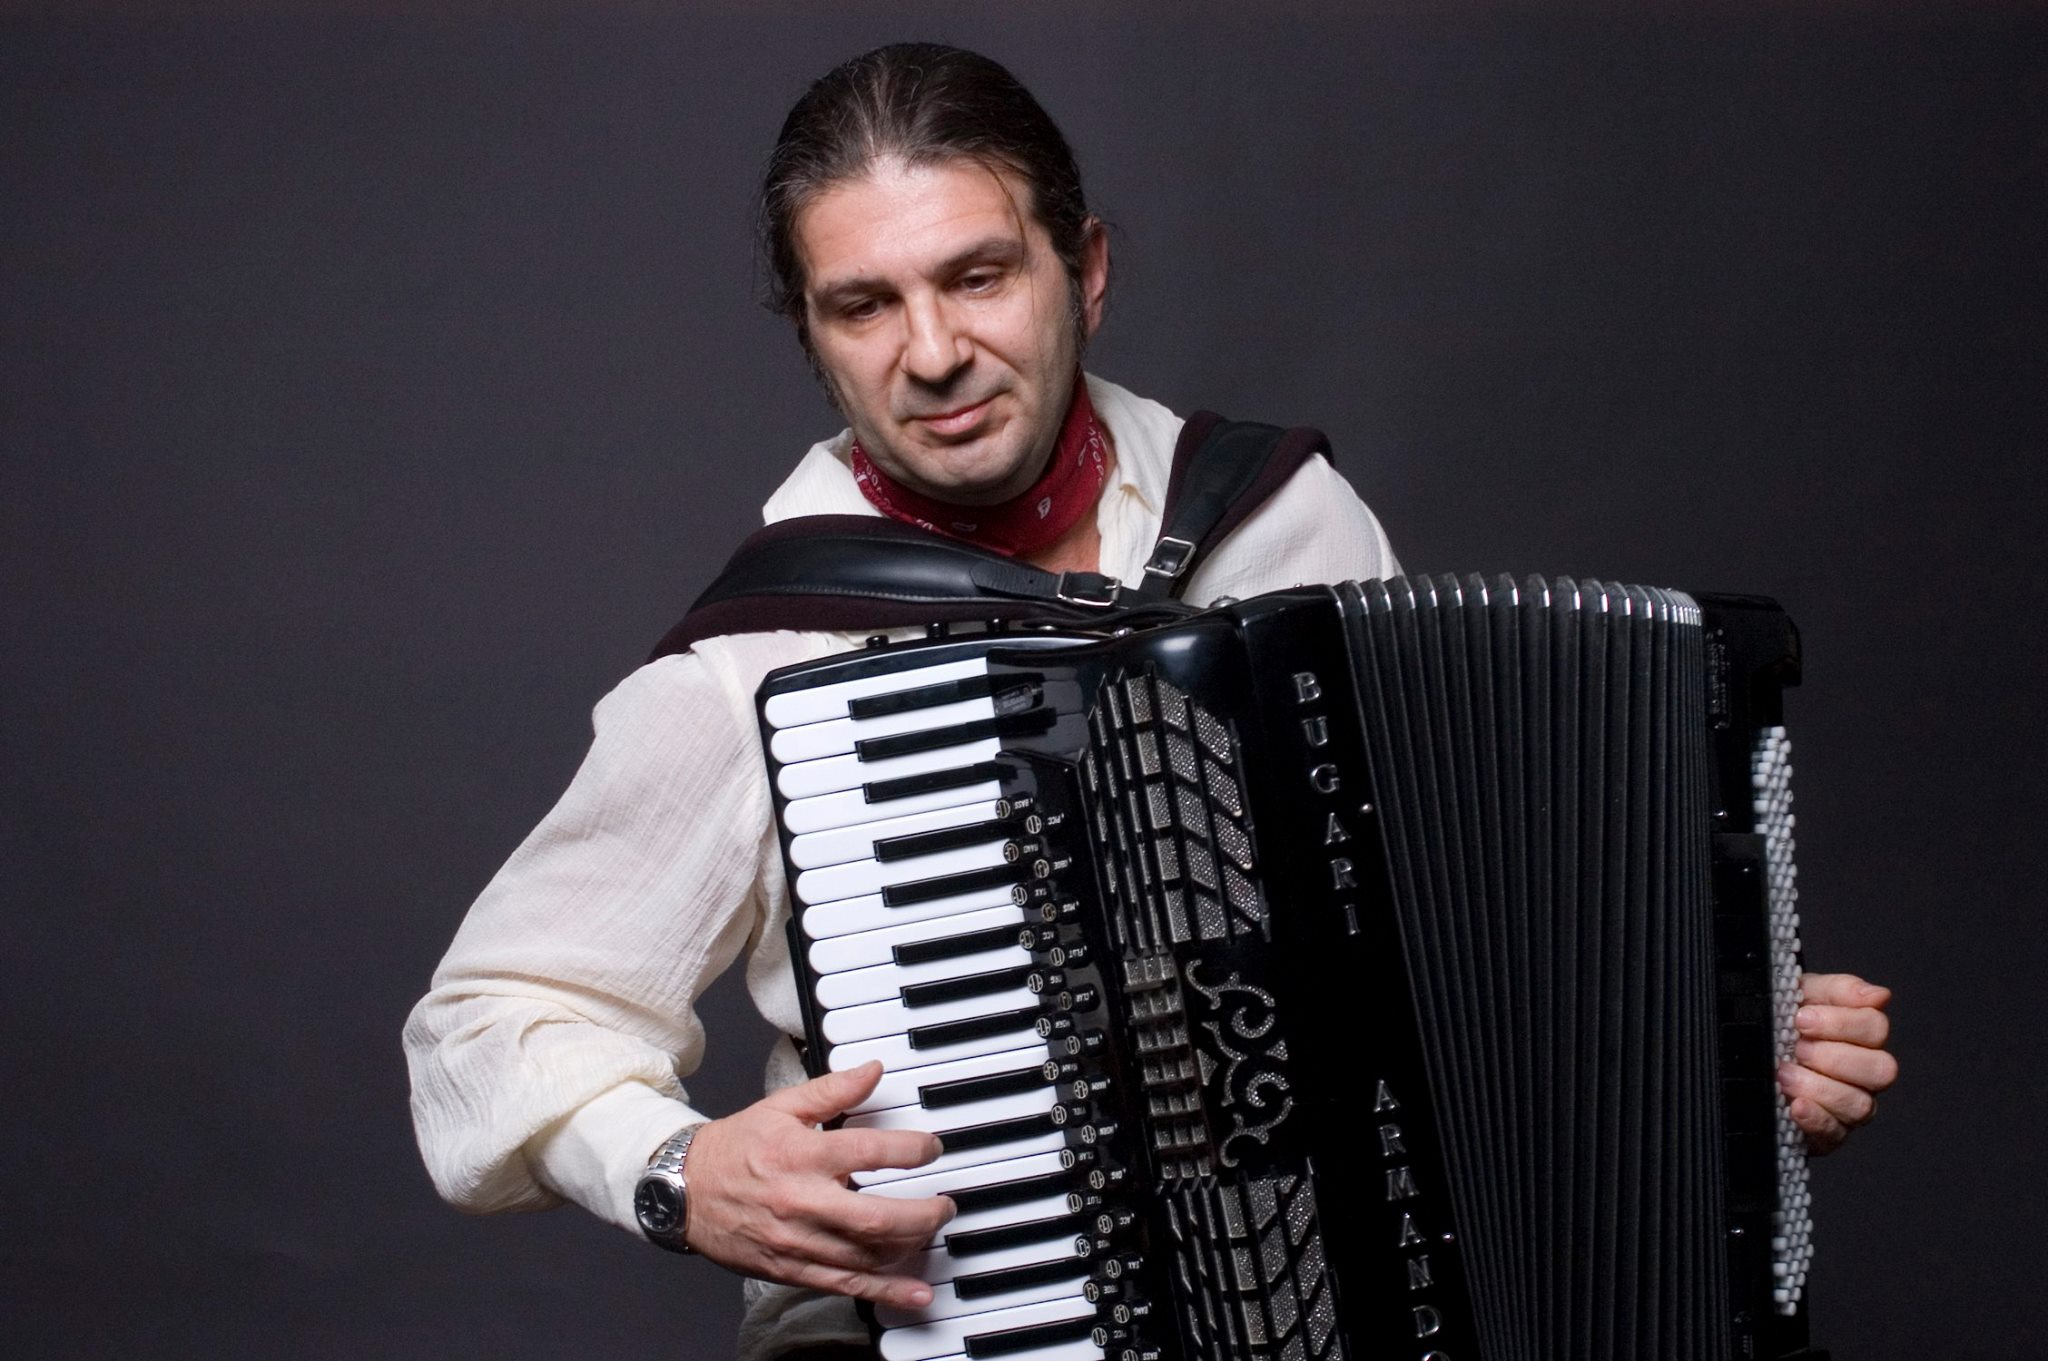 Roberto Cassan playing an accordion